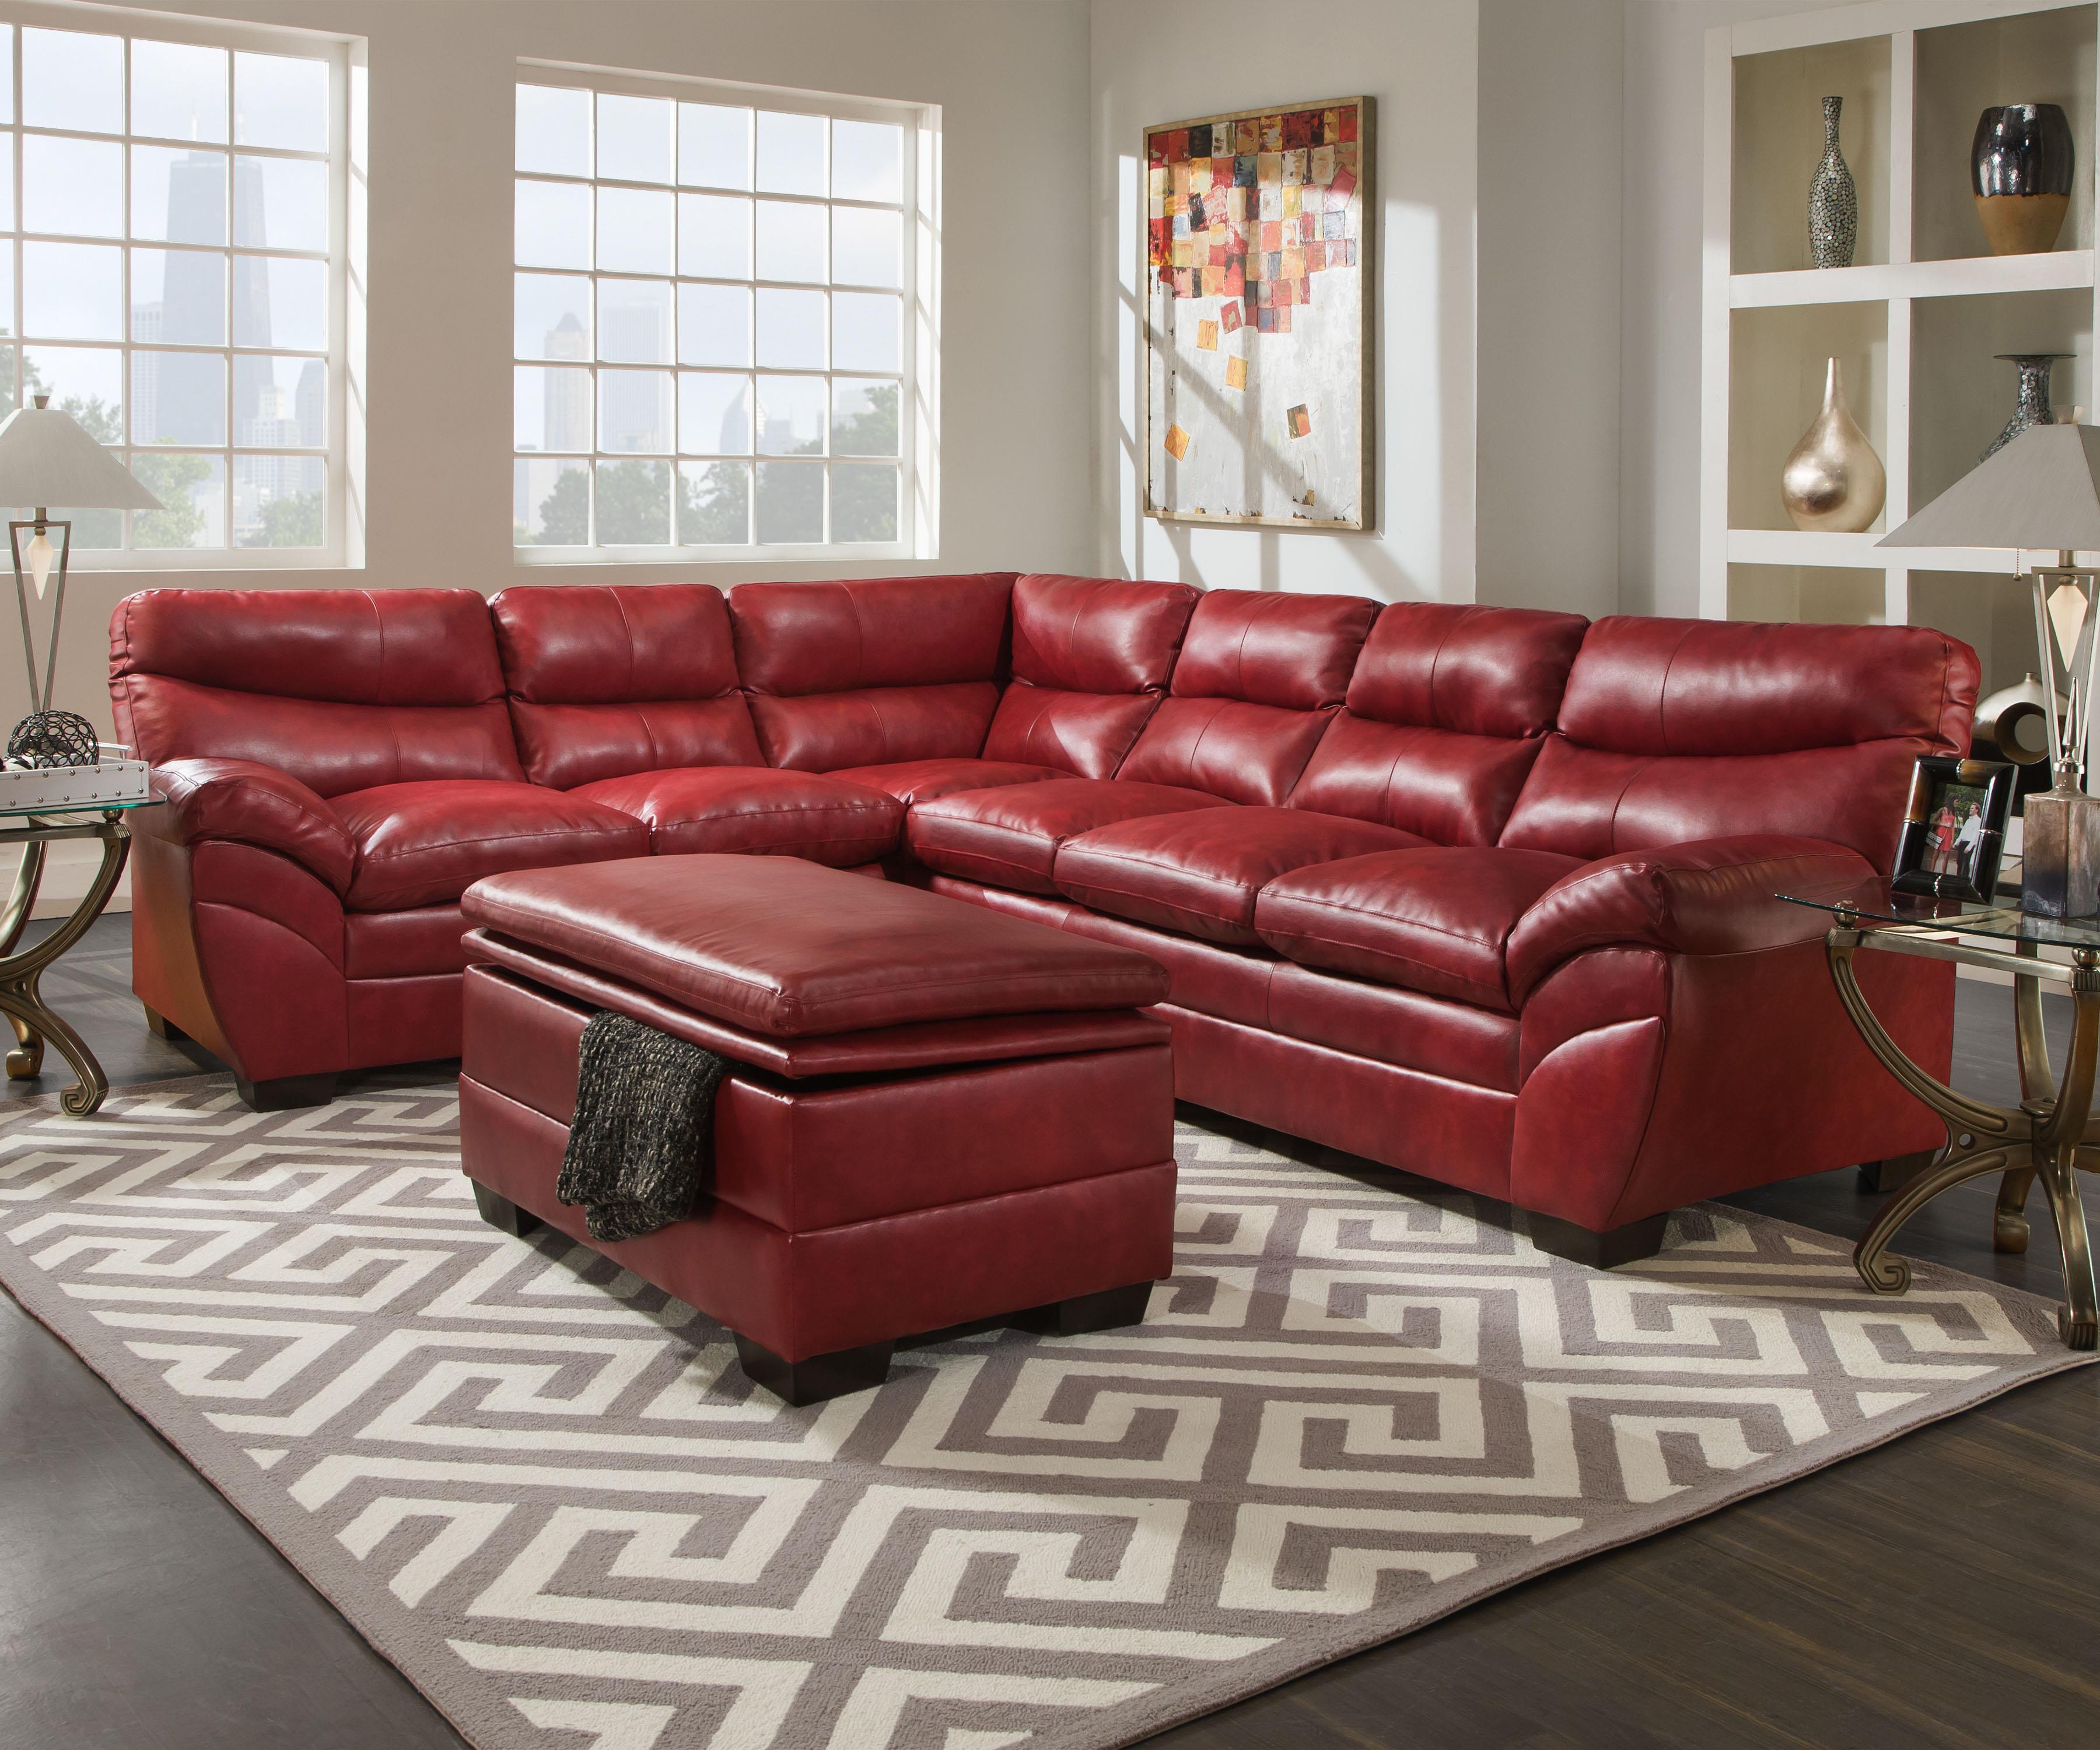 United Furniture Industries 9515 Casual Sectional Sofa - Item Number: 9515LAFBumpSofa+RAFSofa-Cardinal